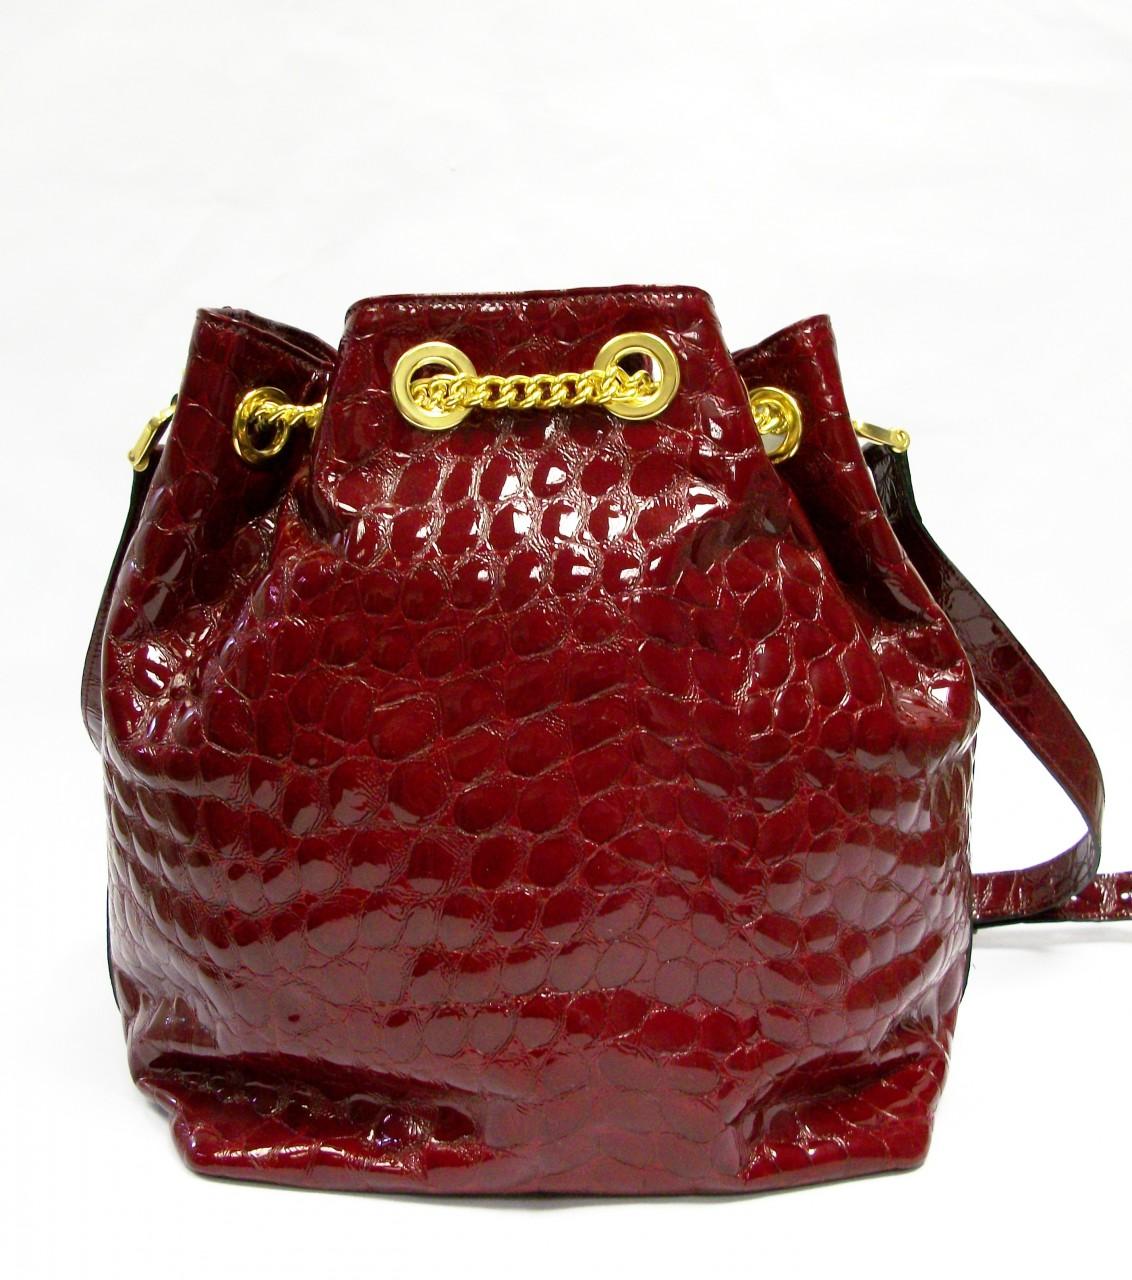 Cambardi bag